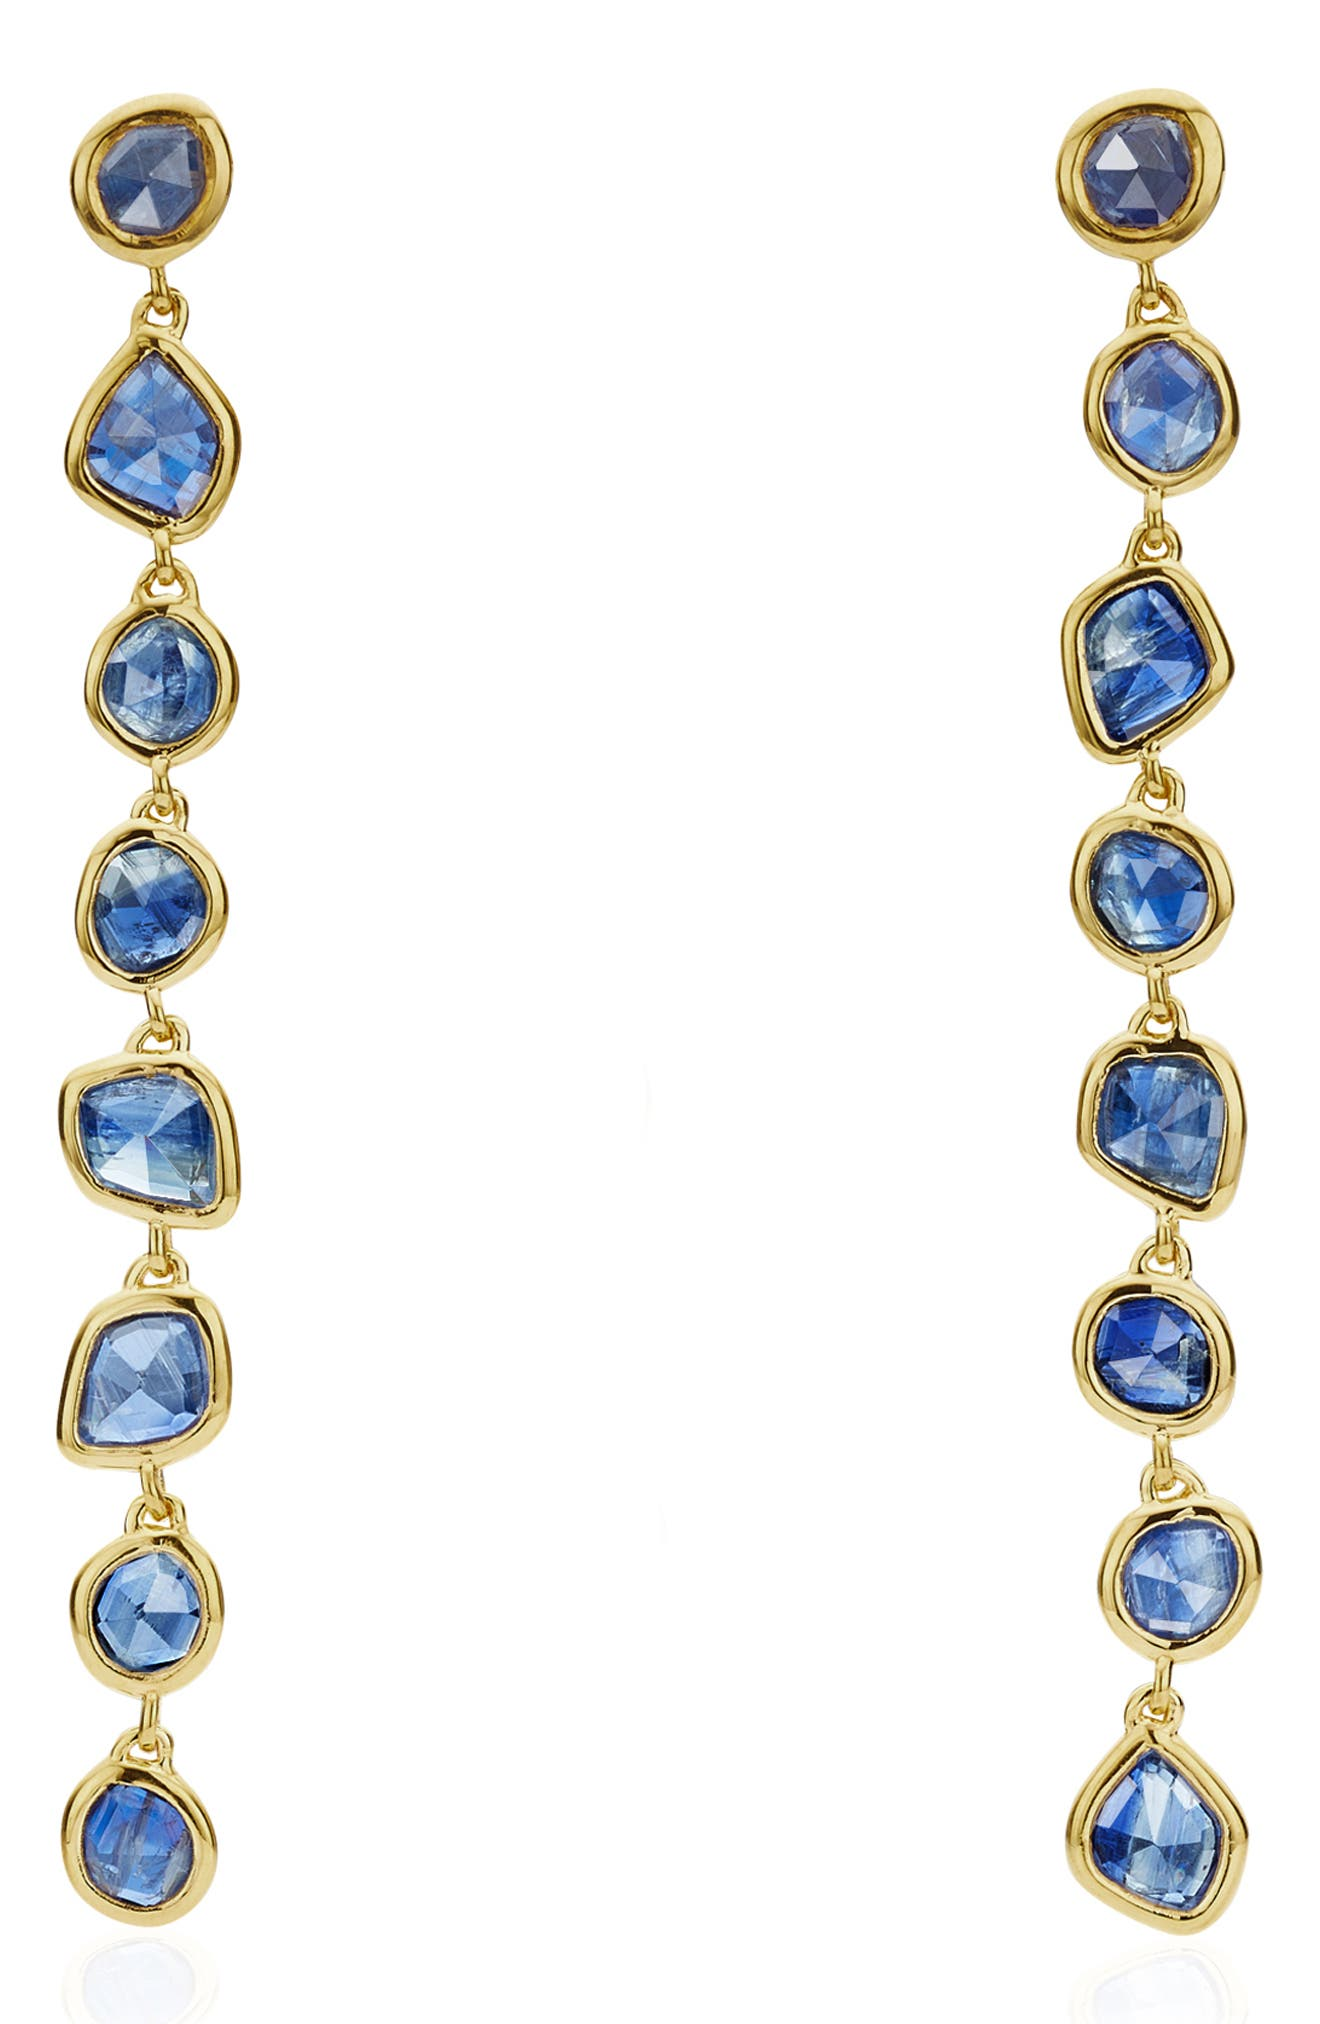 Siren Mini Nugget Earrings,                             Main thumbnail 1, color,                             GOLD/ KYANITE